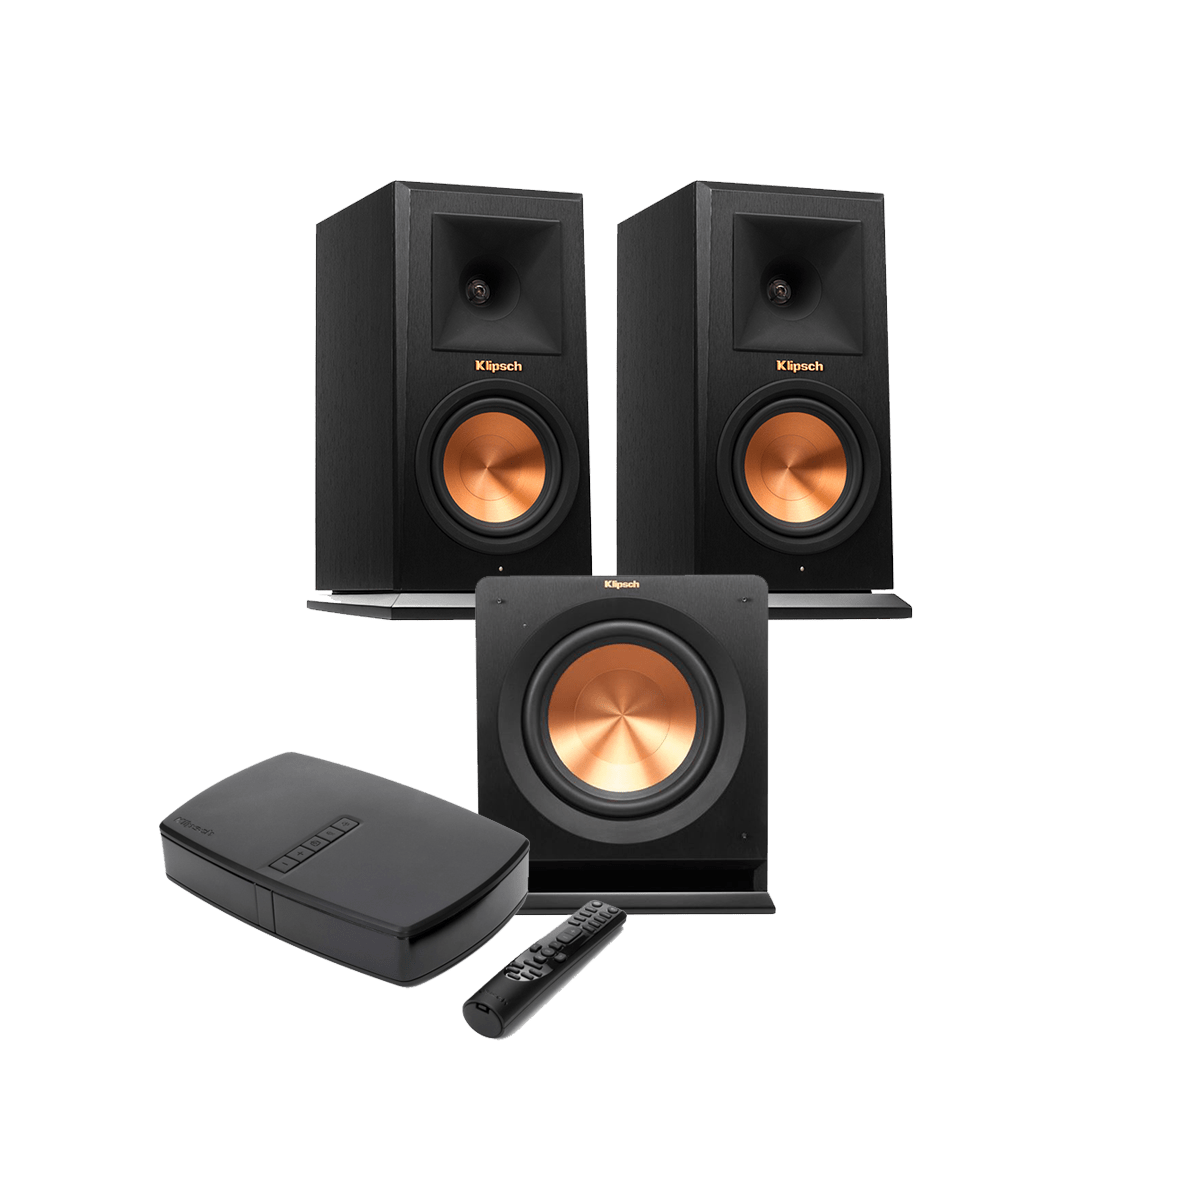 klipsch bookshelf speakers. klipsch rp-140wm bundle bookshelf speakers